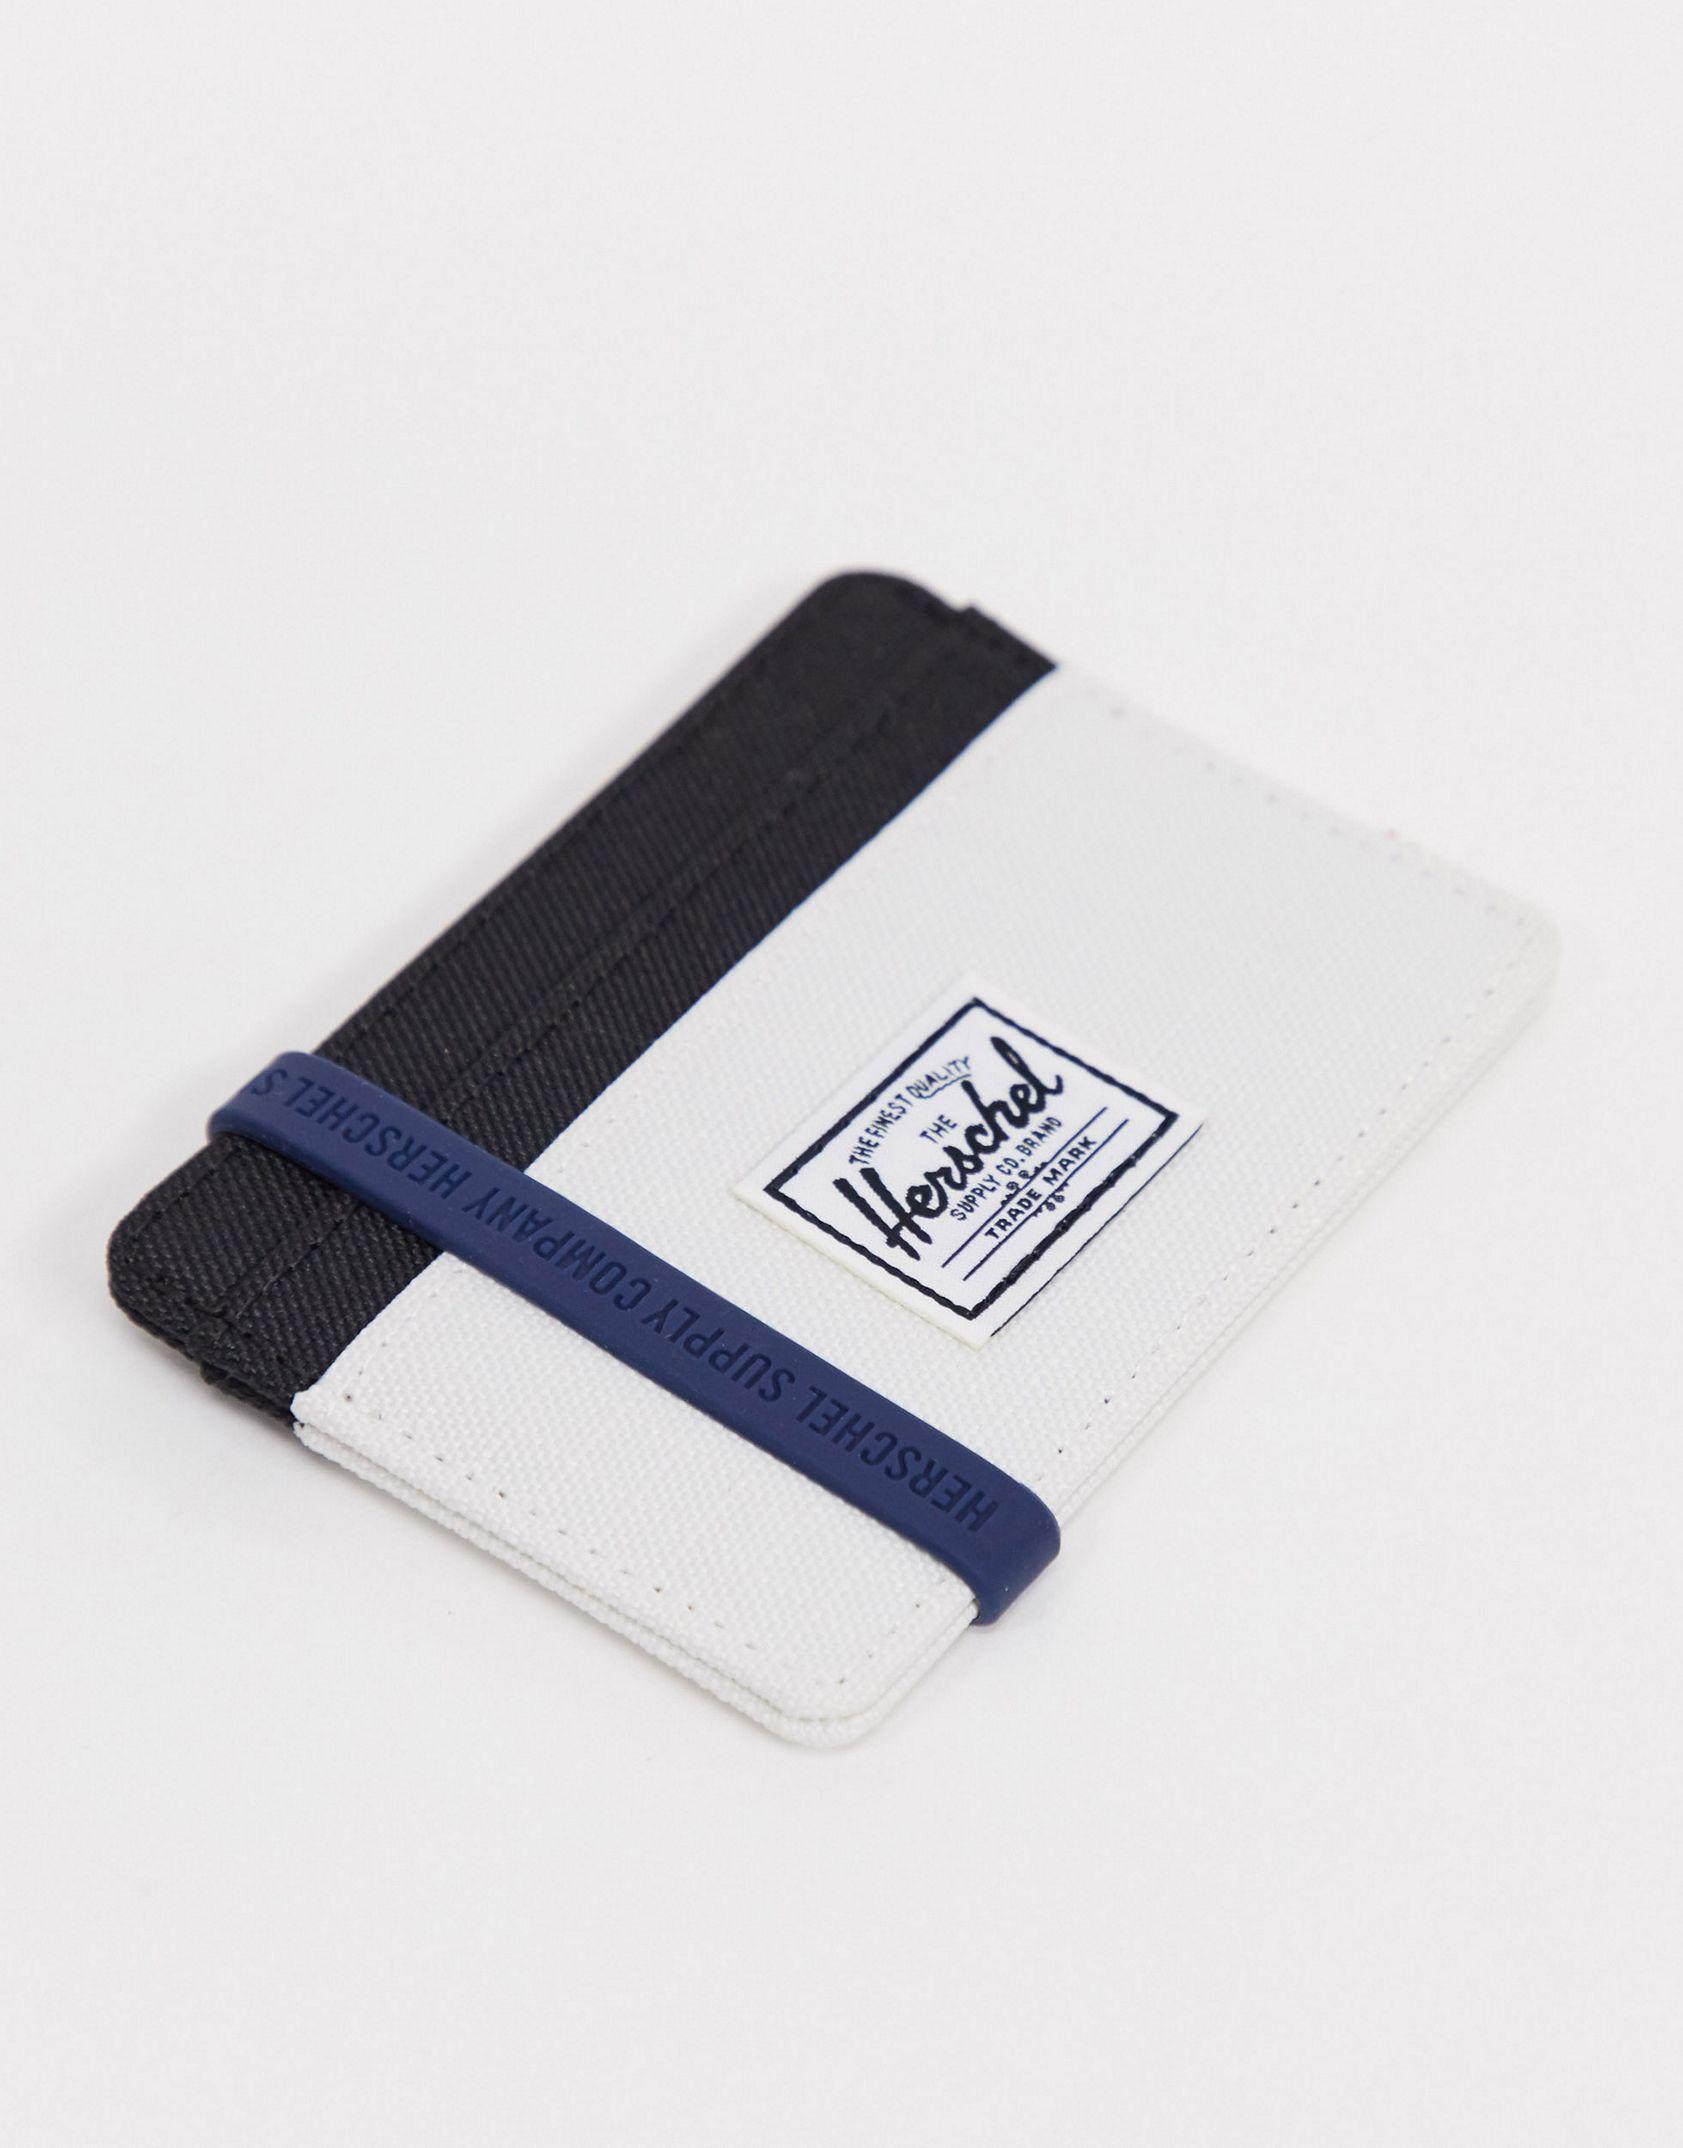 Herschel Supply Co Charlie card holder in block colour - ASOS Price Checker